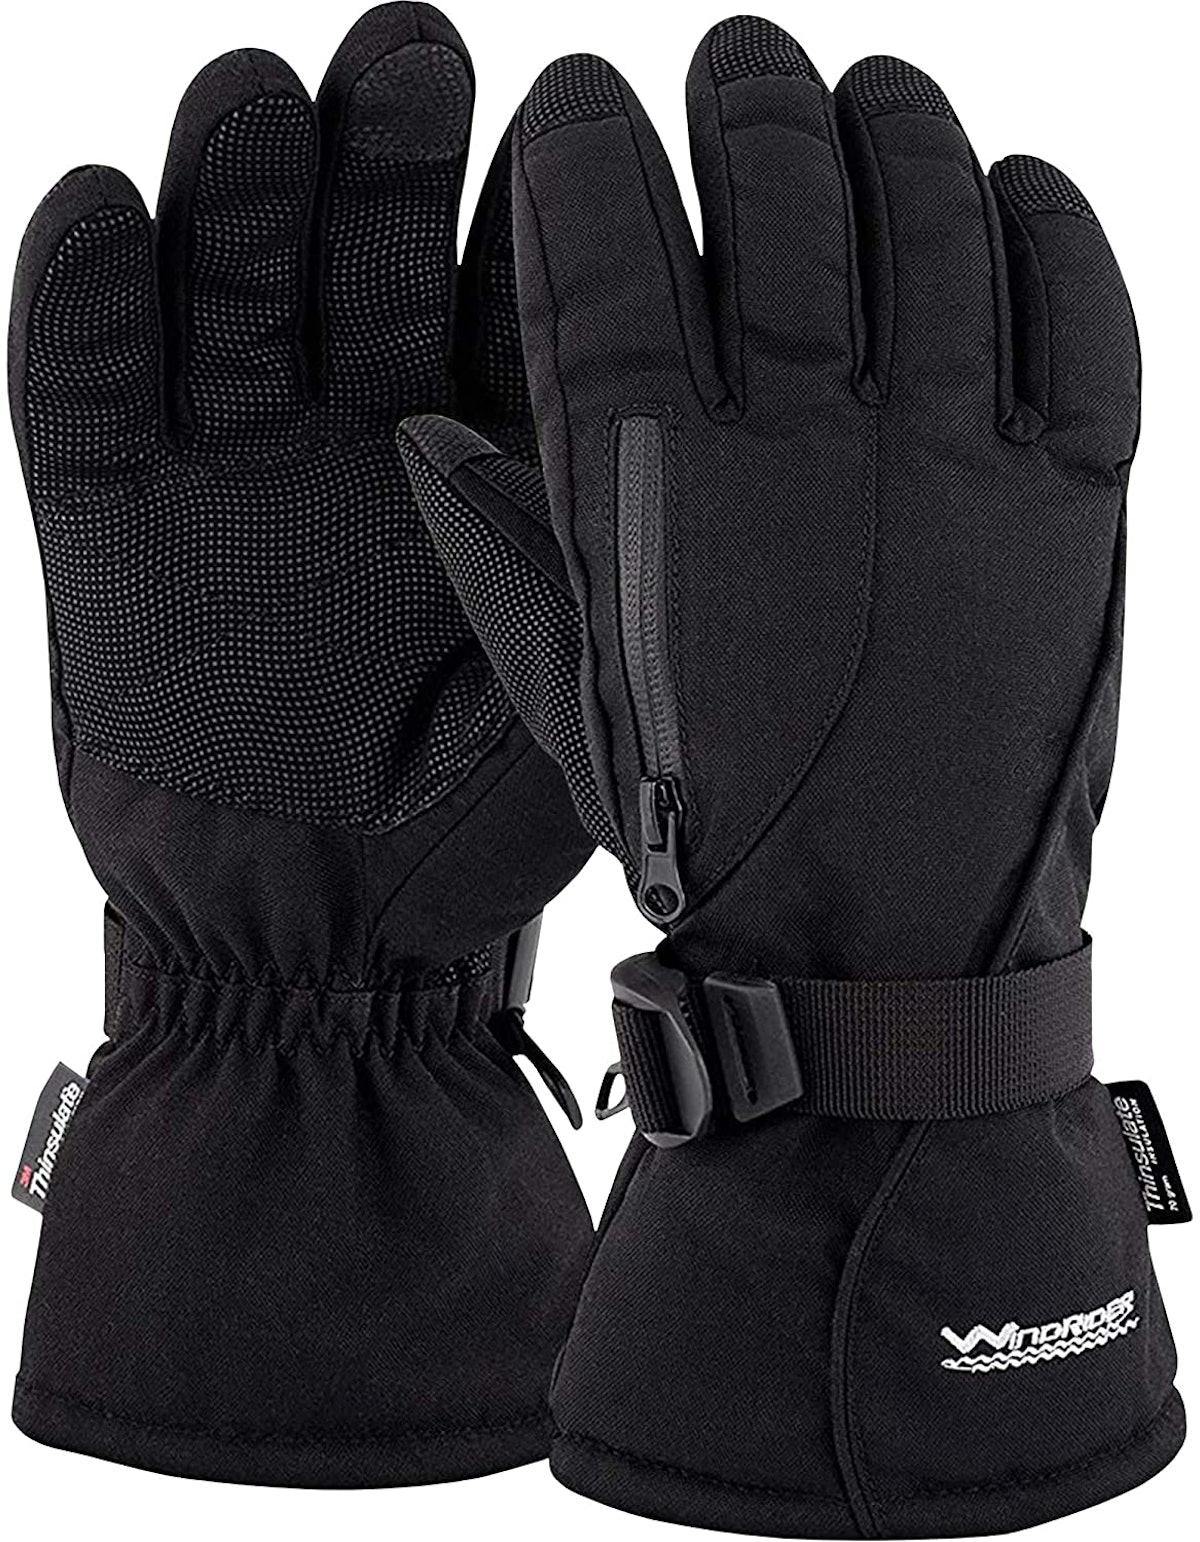 WindRider Rugged Waterproof Winter Gloves